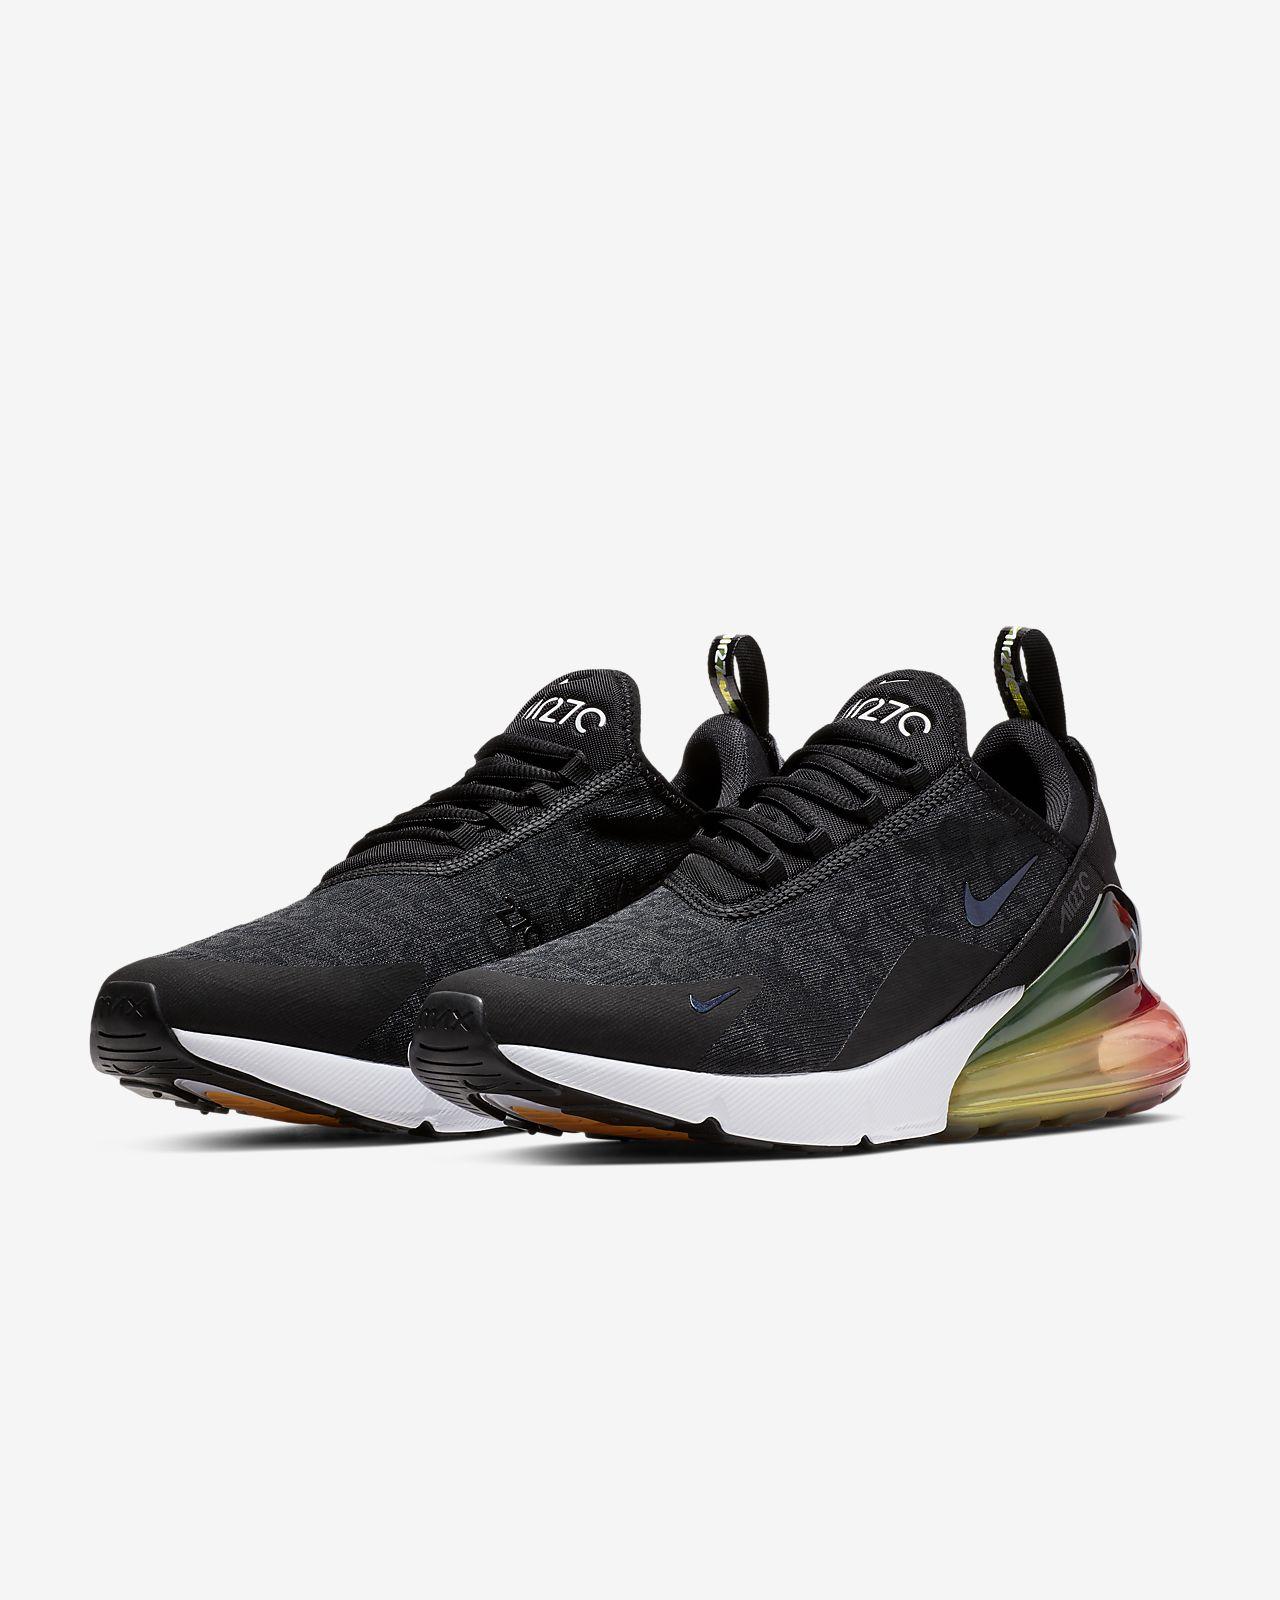 cheap for discount 35d4b 0f6ab ... Nike Air Max 270 SE Men s Shoe